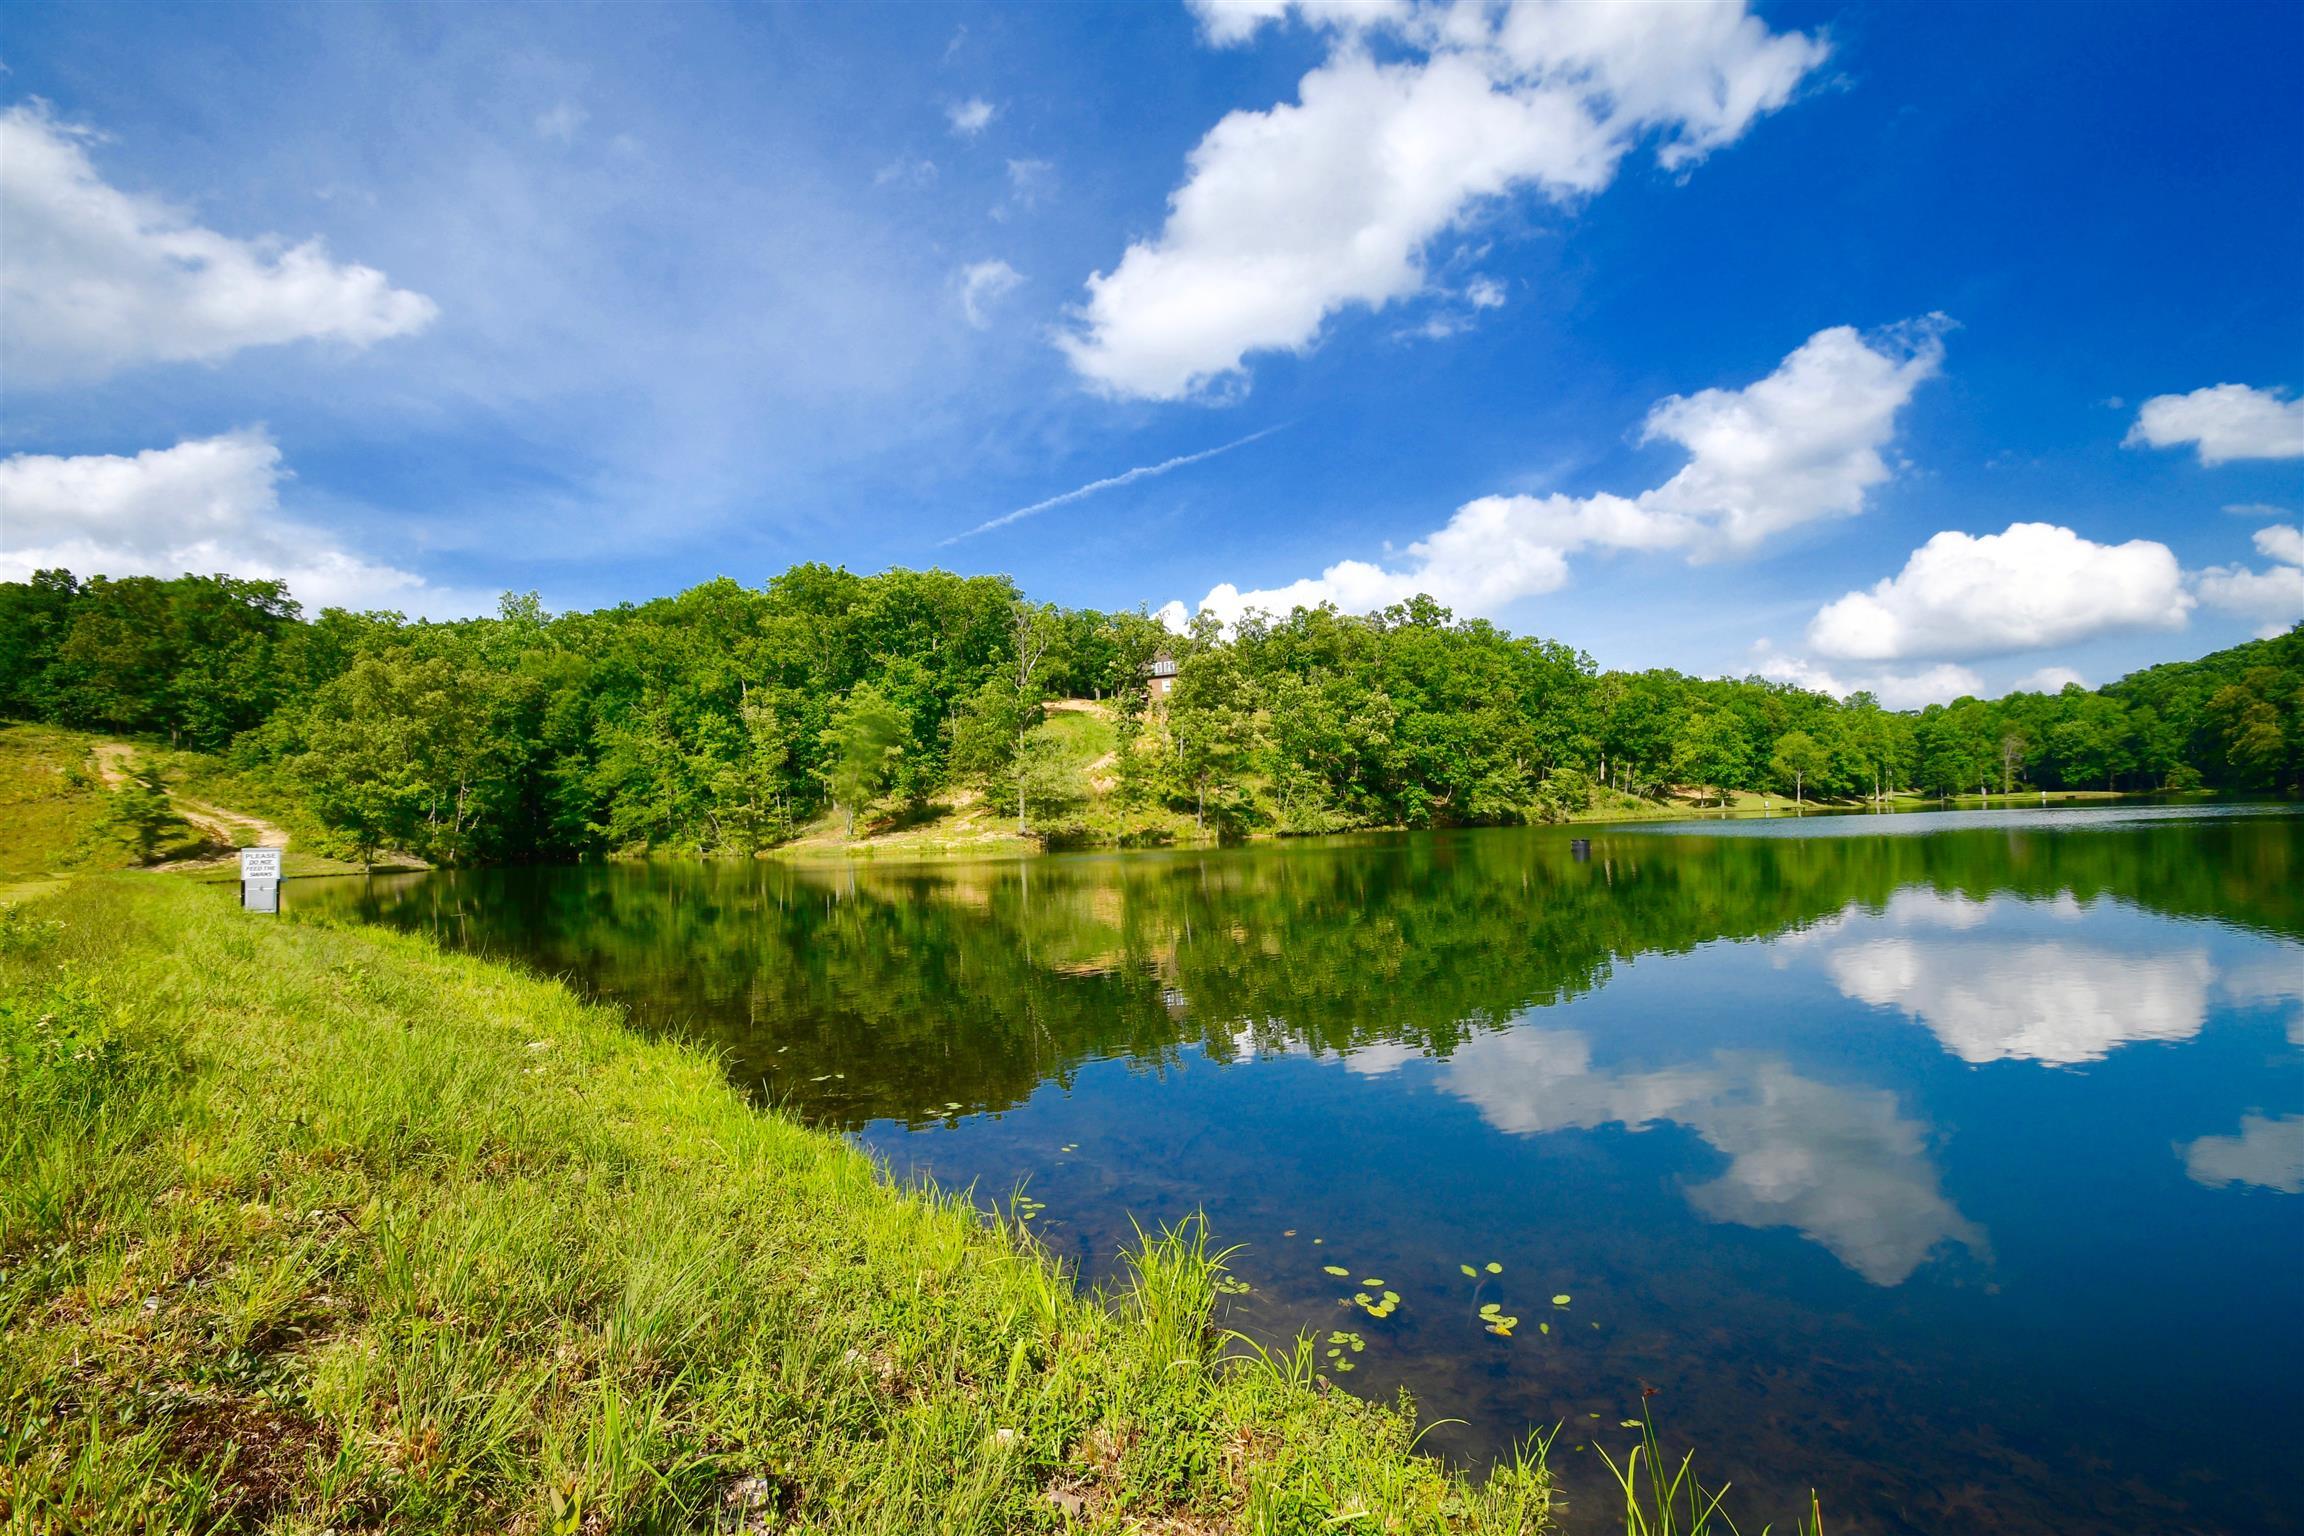 0 Hunt Hollow, Lawrenceburg, TN 38464 - Lawrenceburg, TN real estate listing